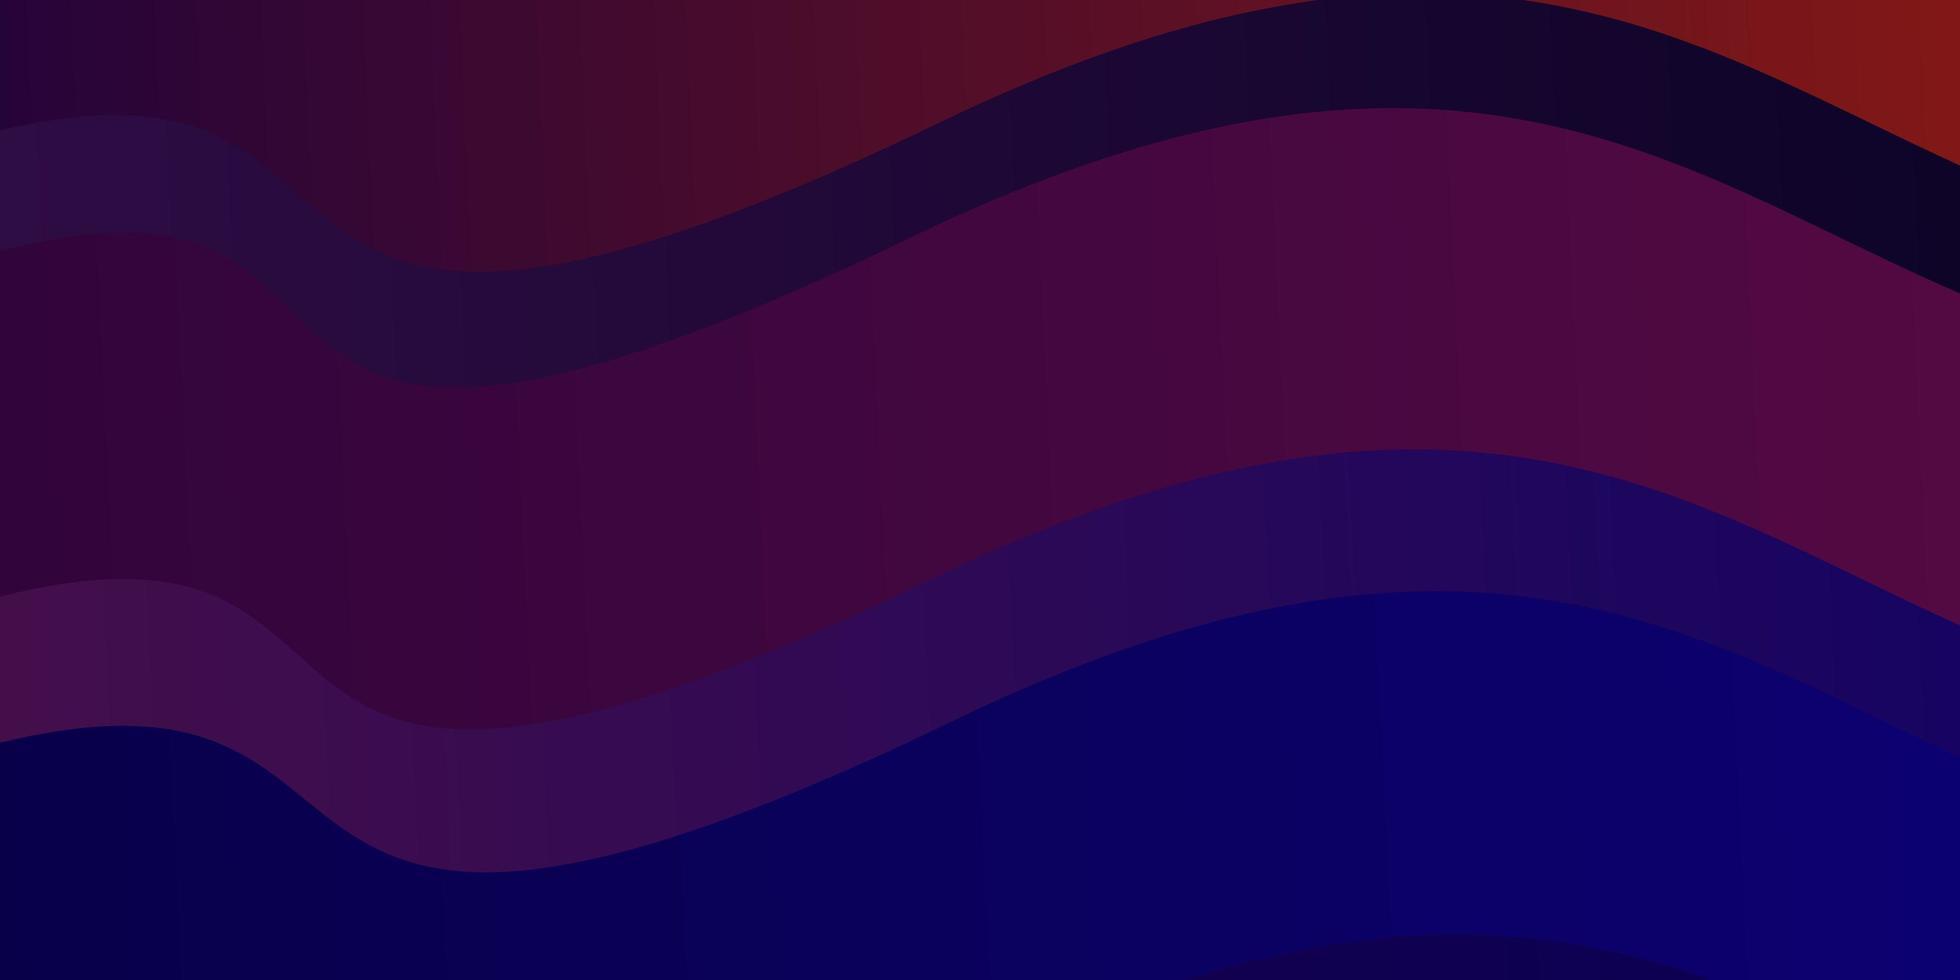 dunkelblaues, rotes Vektormuster mit Kurven. vektor